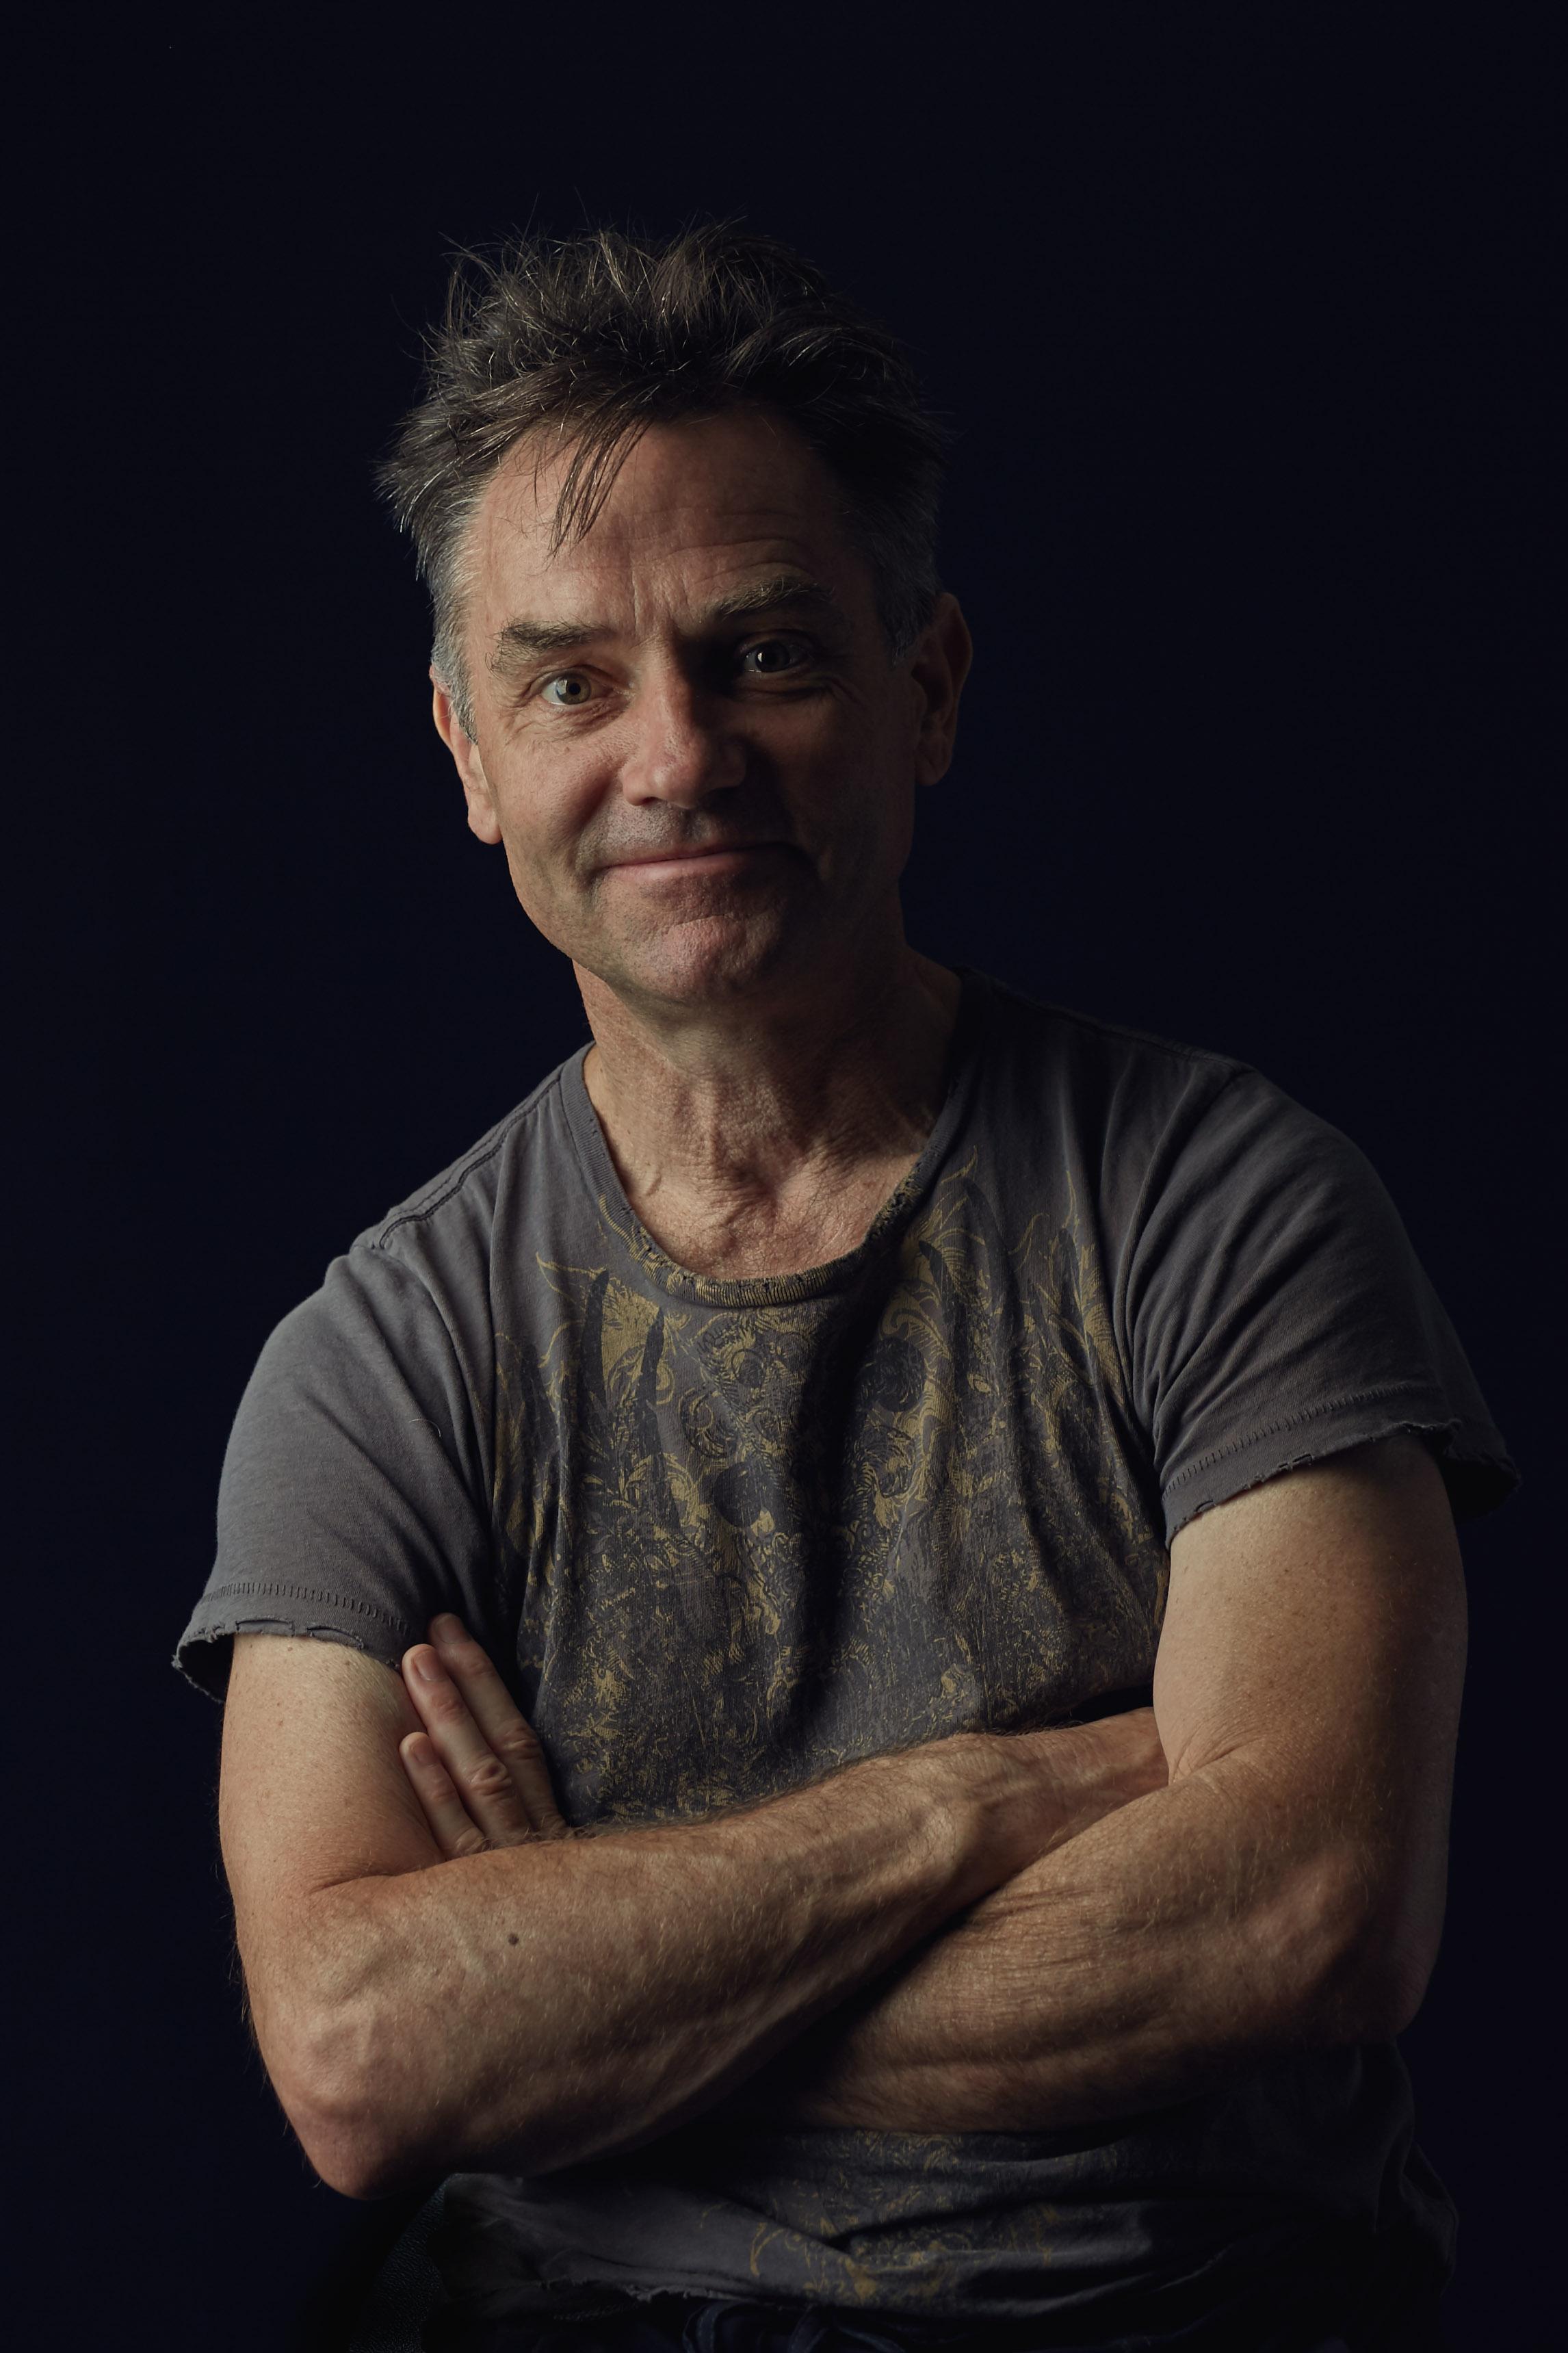 Karl Baumann